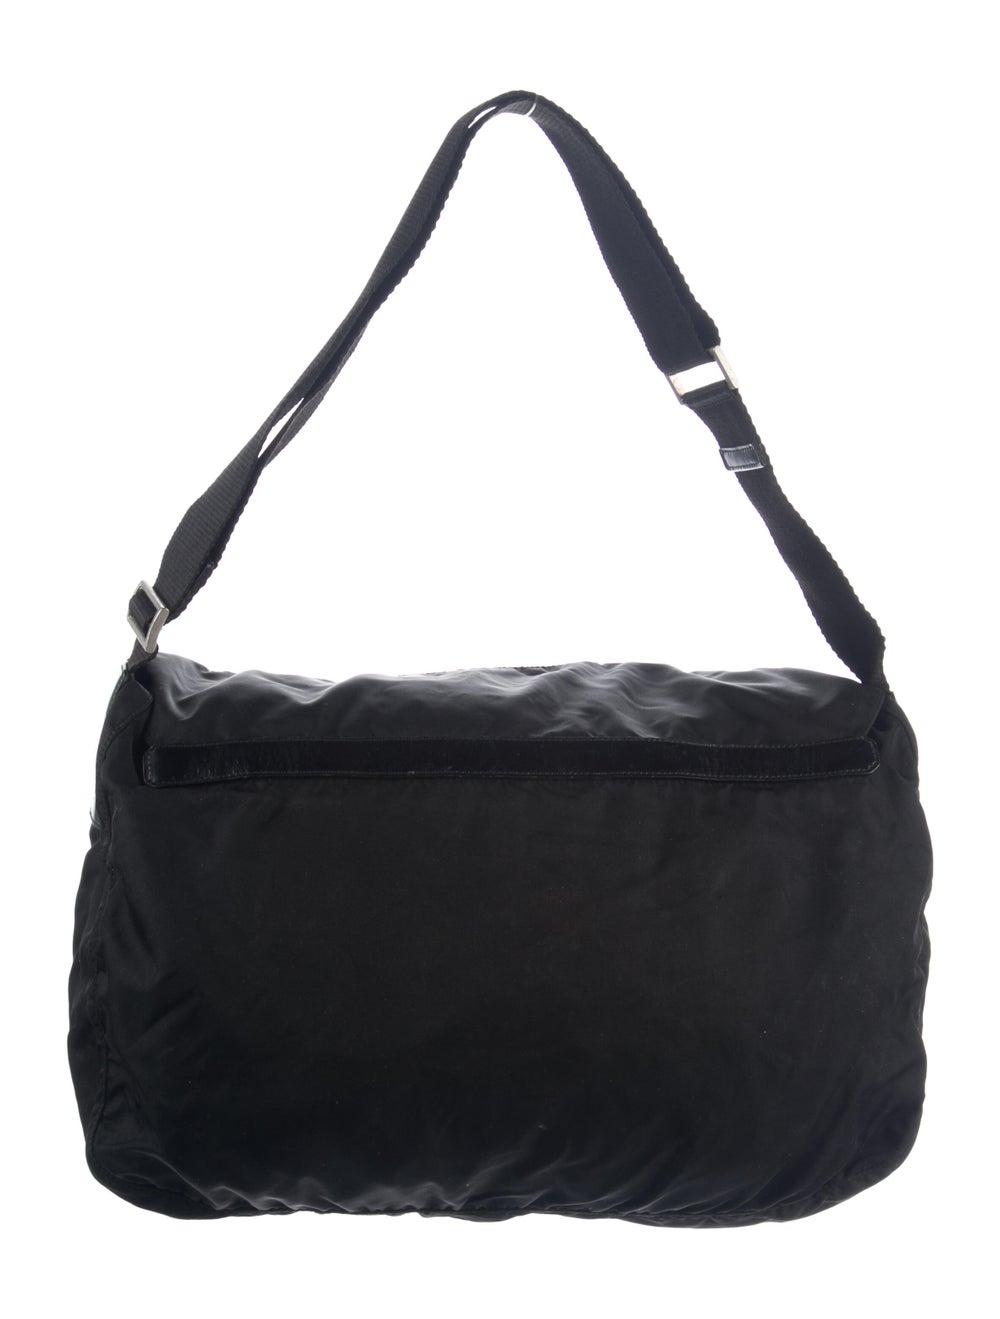 Prada Vela Messenger Bag Black - image 4